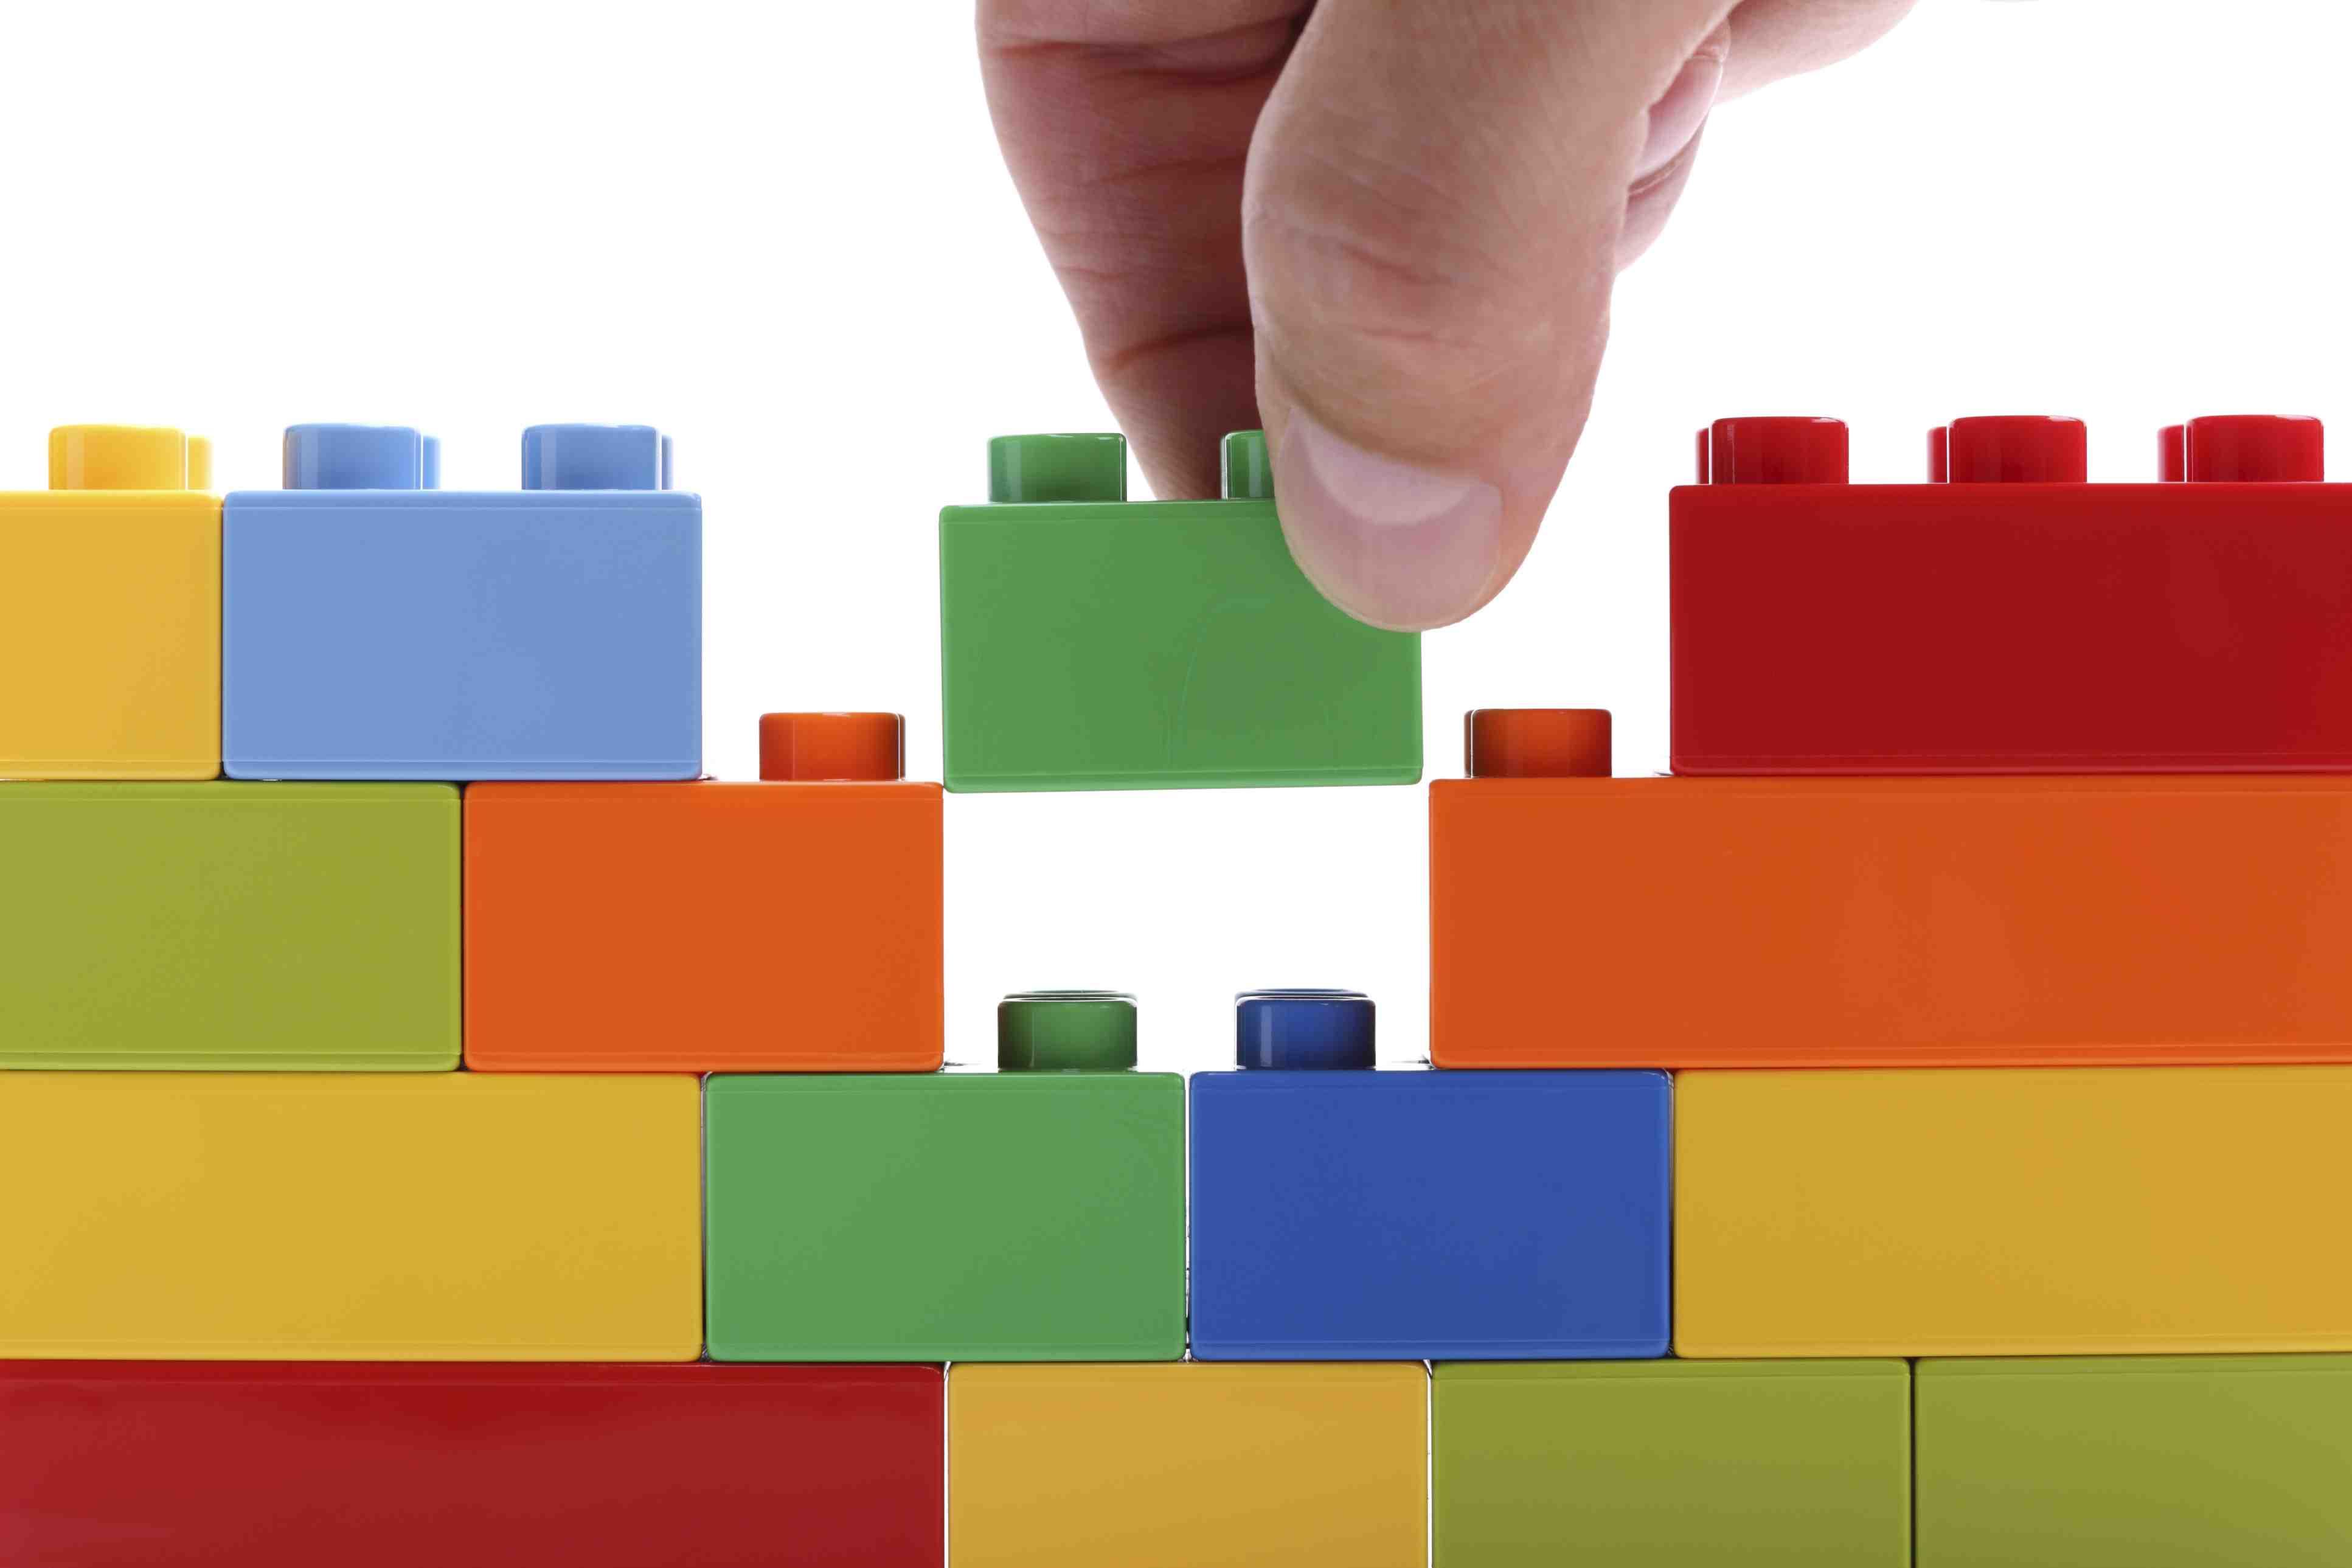 Building a USANA Body with Brad: 5 Bricks of Health